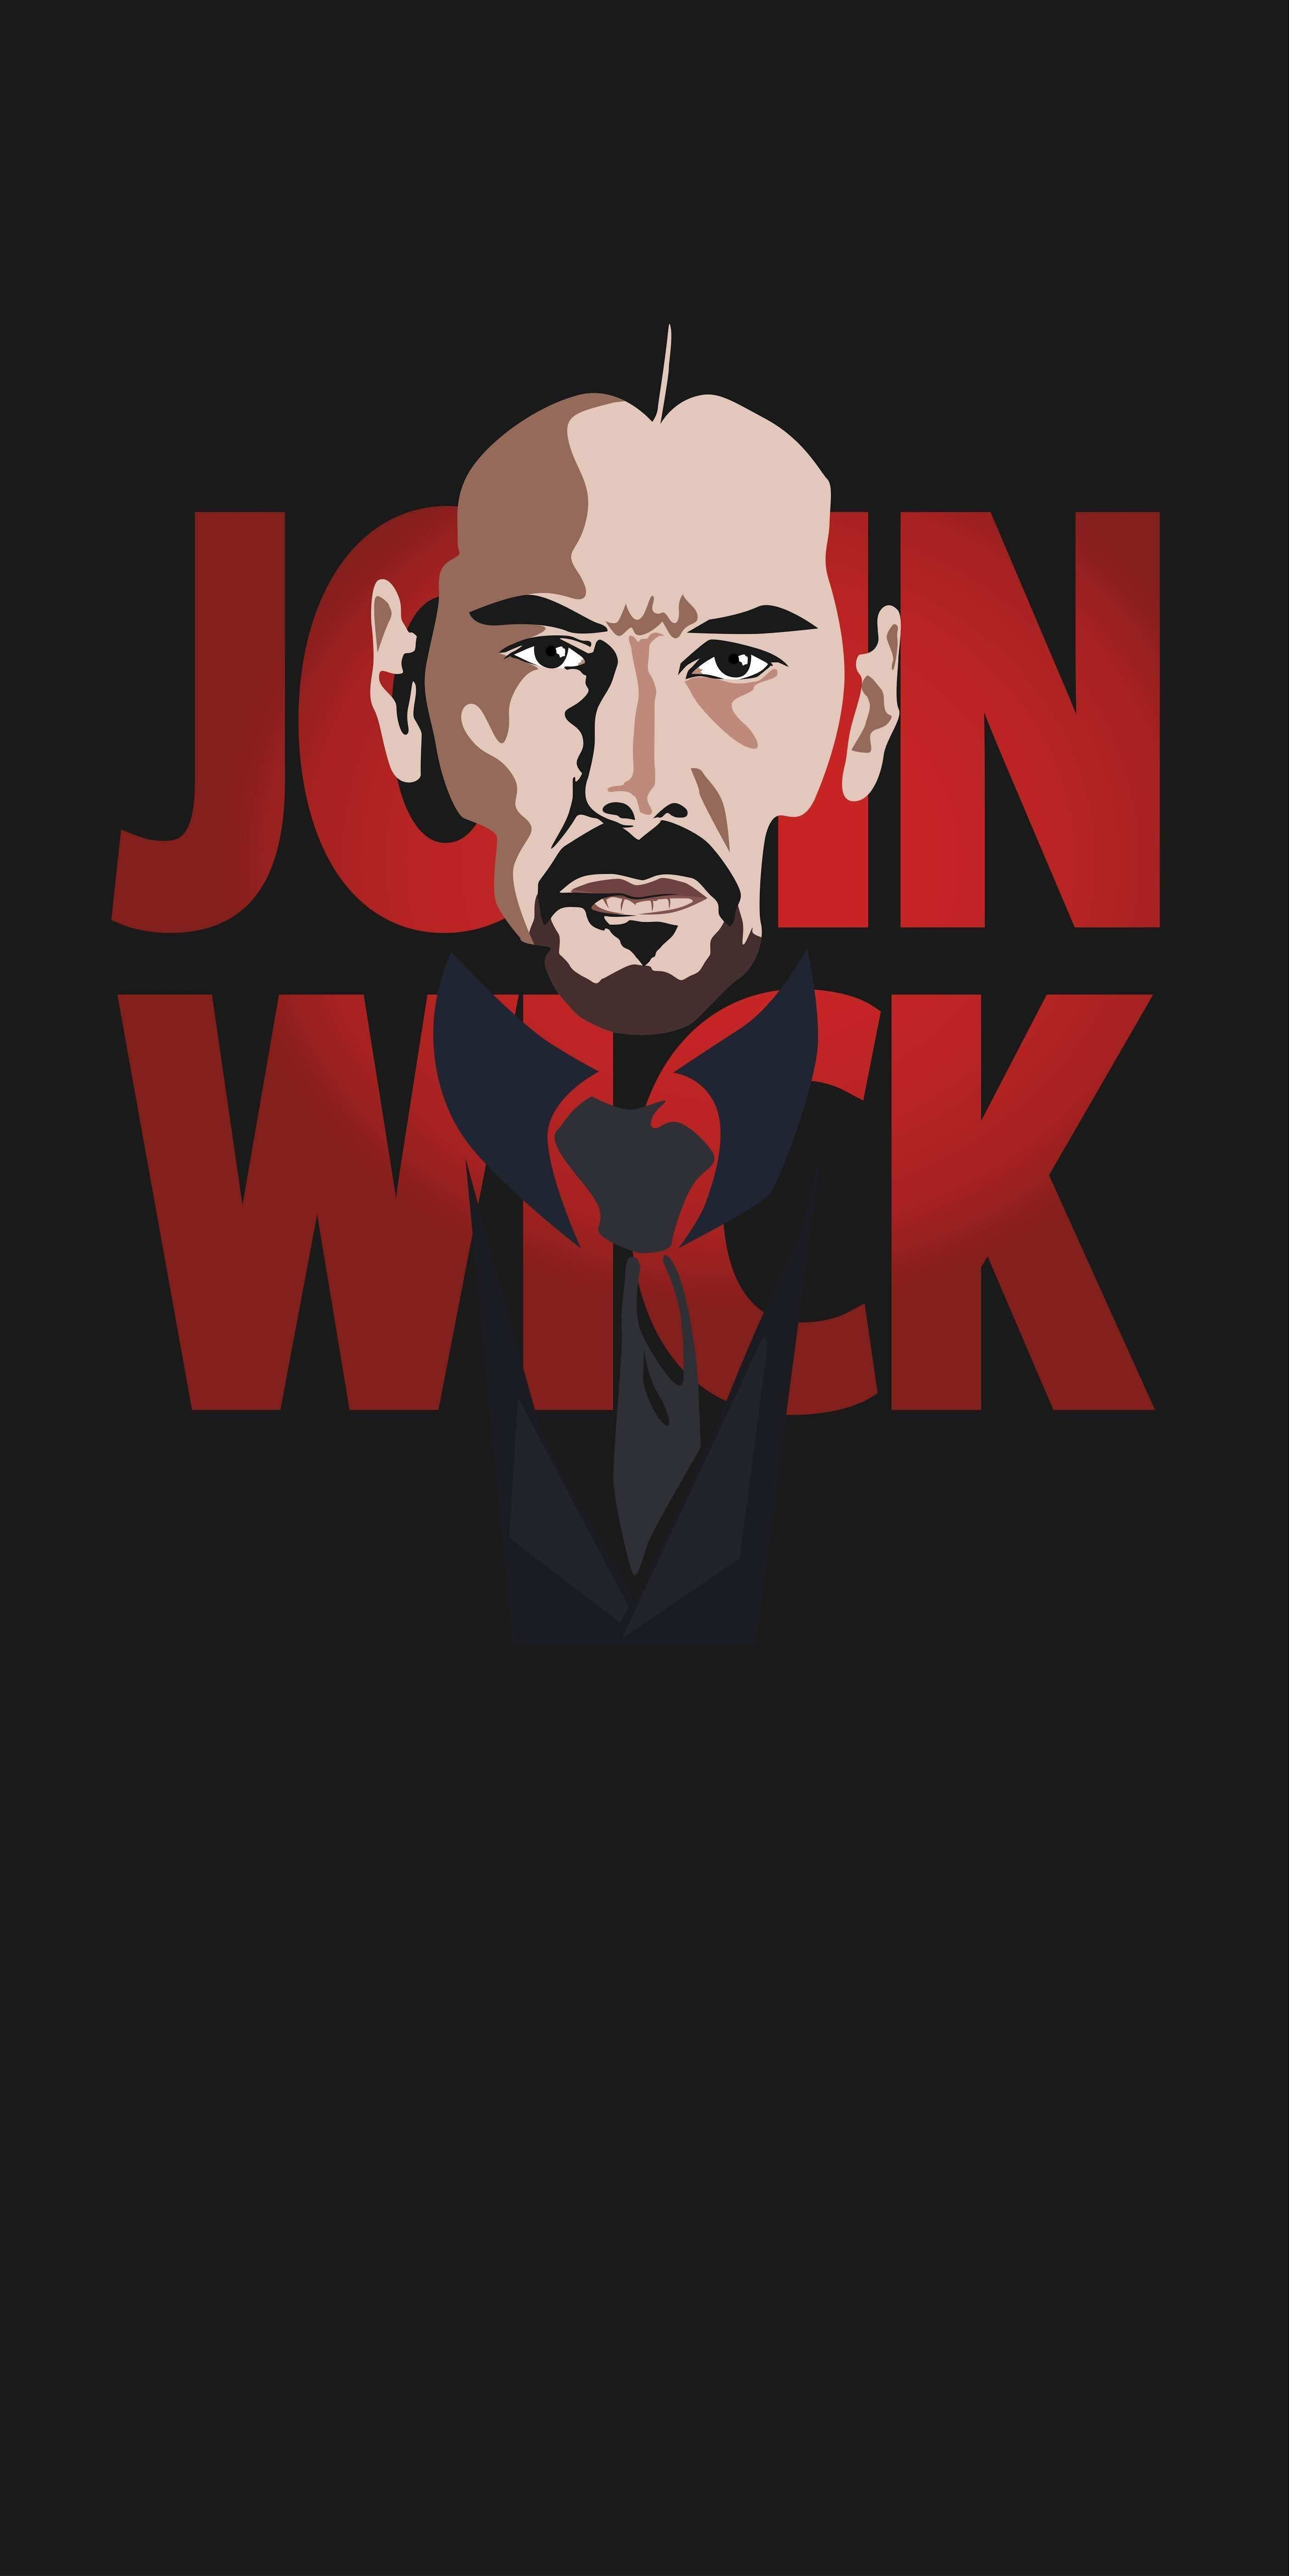 John Wick iPhone Wallpaper 4K in 2020 John wick movie